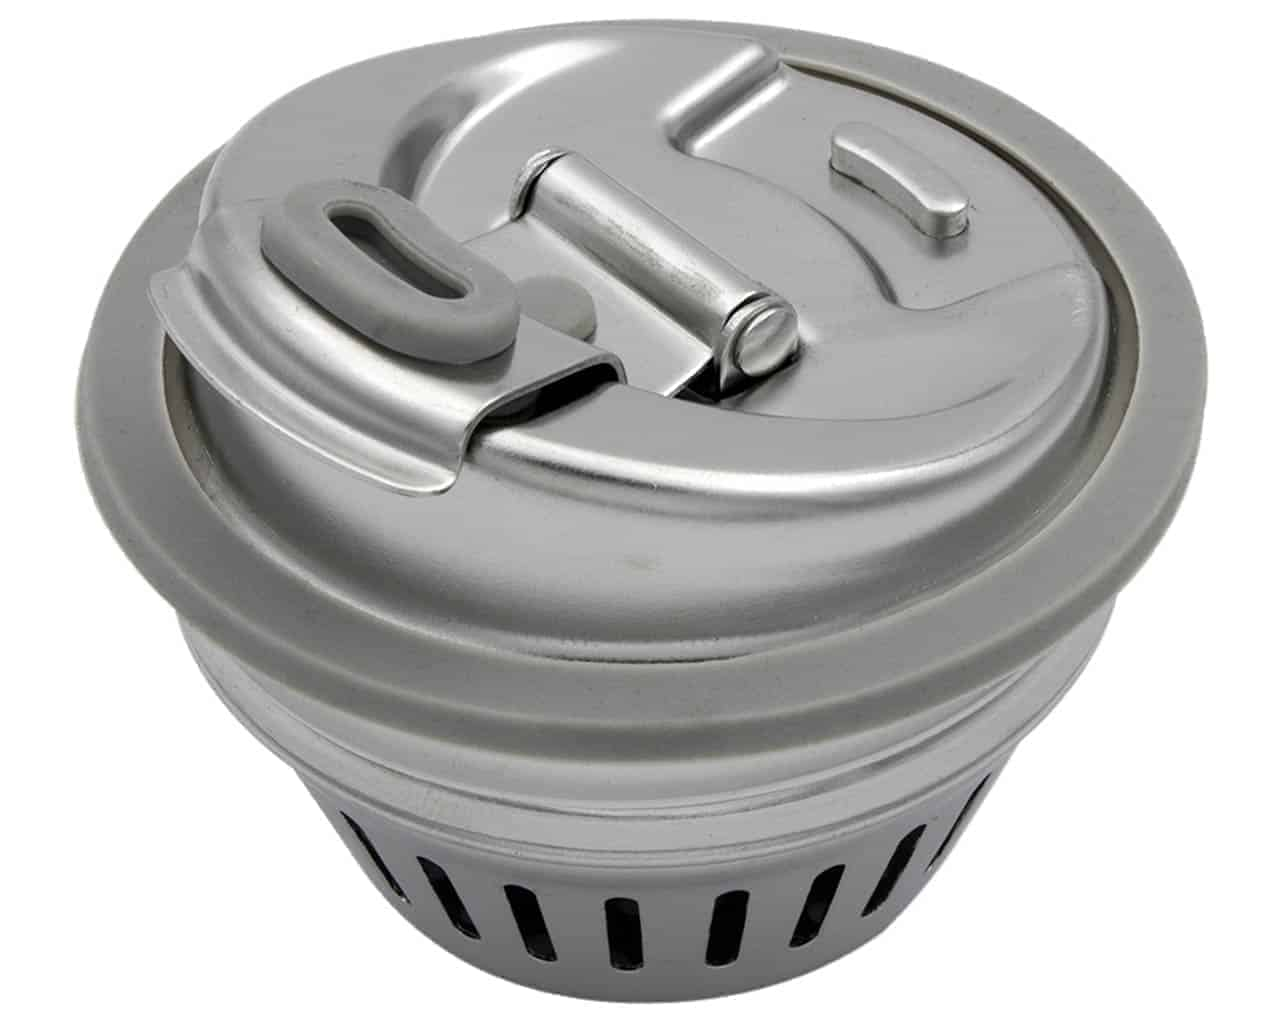 jarware-leak-proof-stainless-steel-drinking-lid-regular-mouth-mason-jars-closed